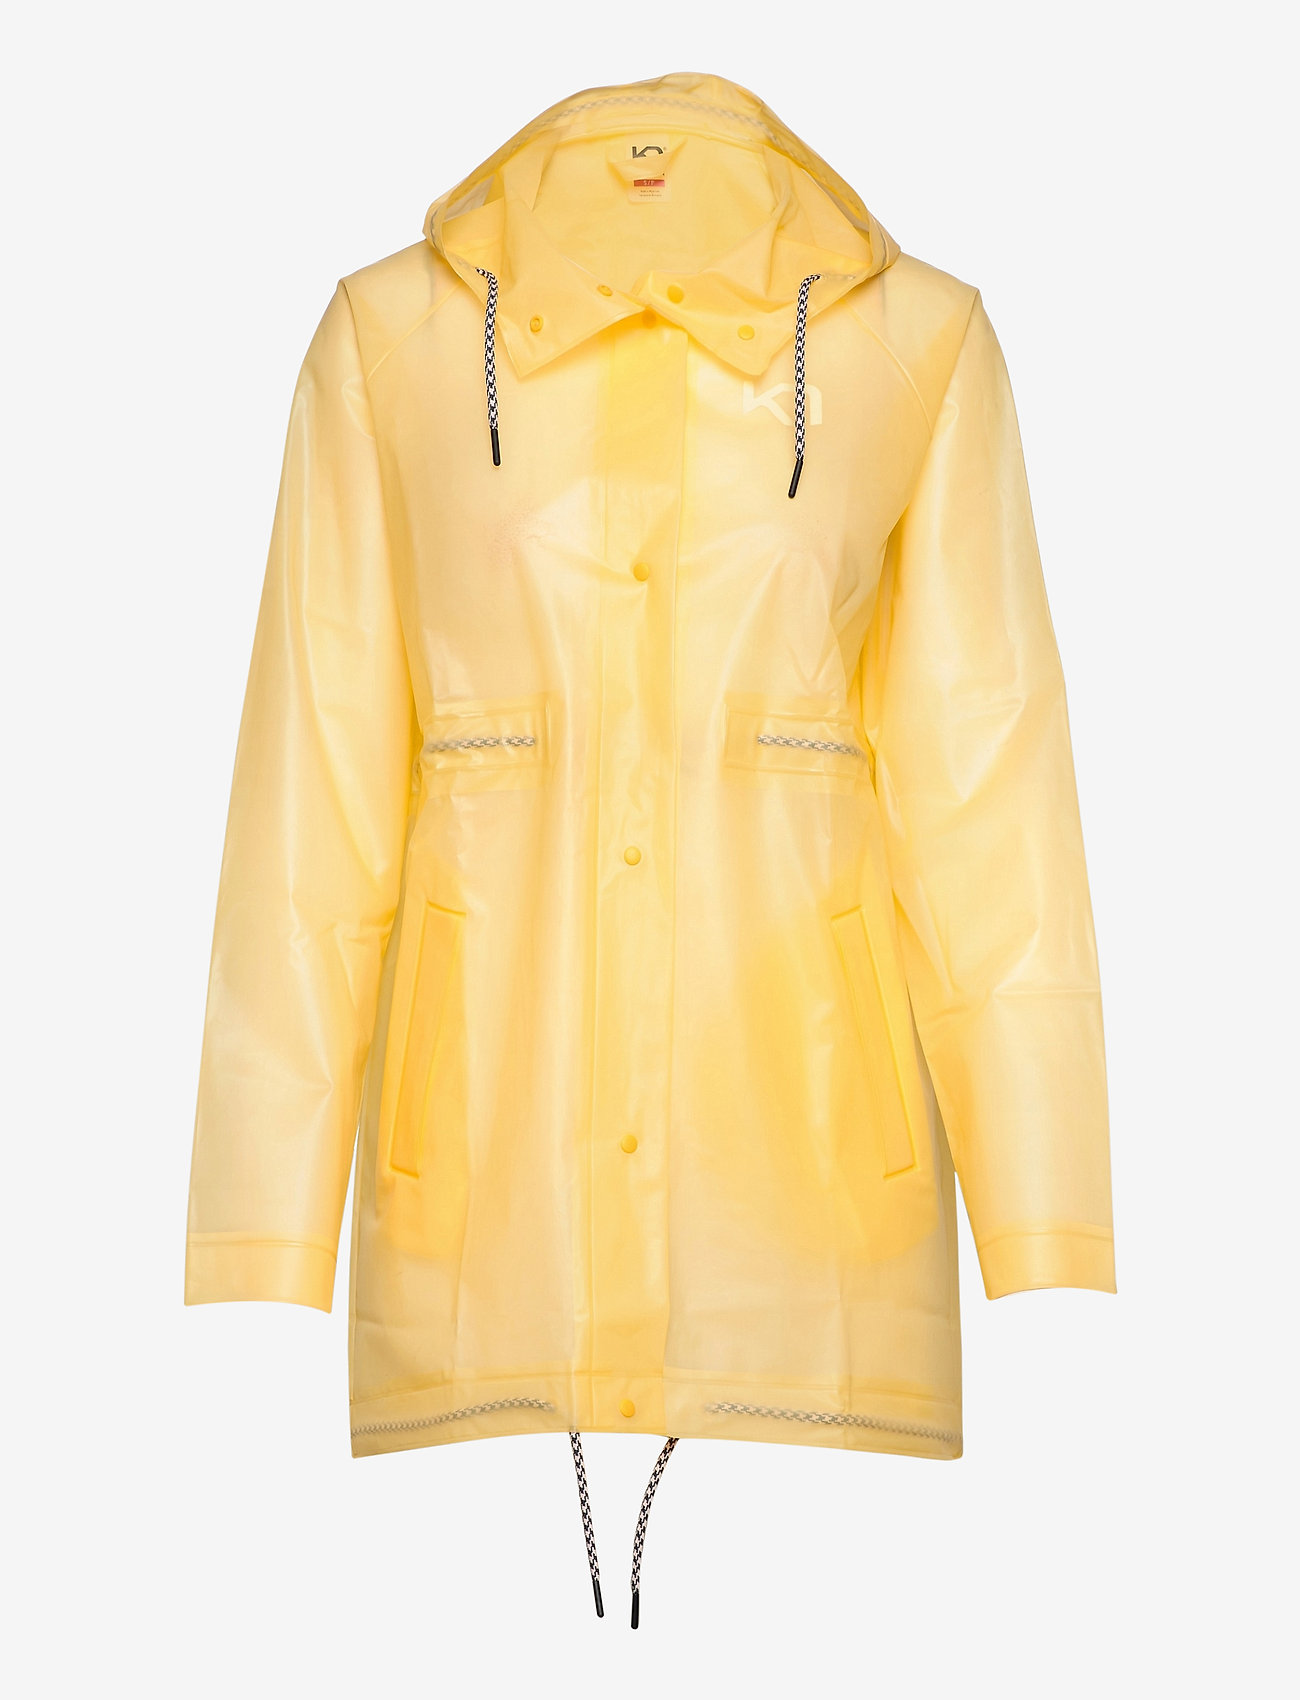 Kari Traa - BULKEN JACKET - manteaux de pluie - shine - 0